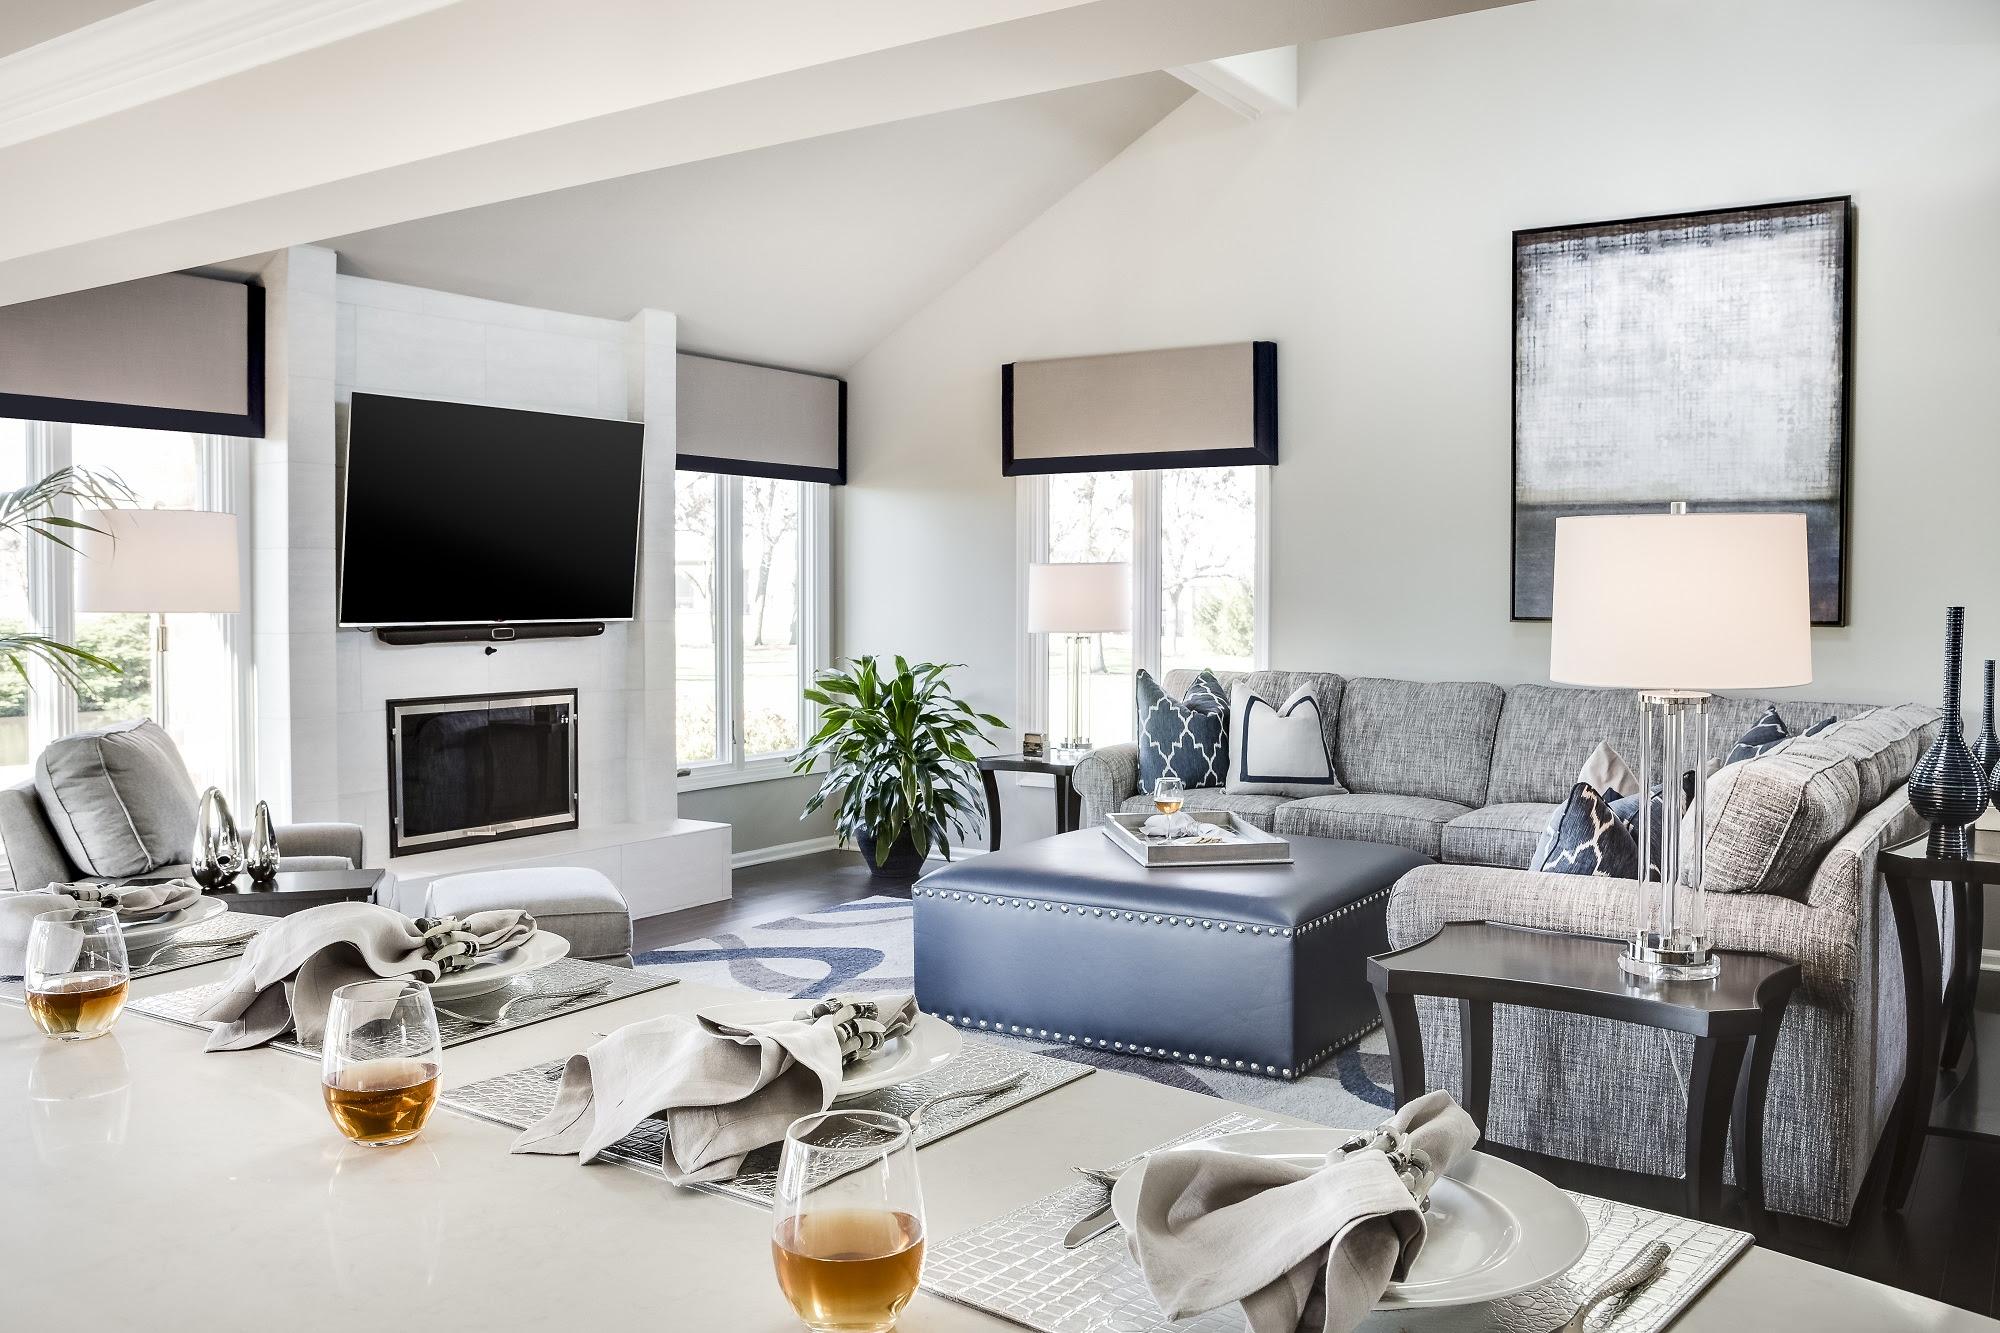 Fall 2015 Interior Design Trends  Design Connection, Inc.